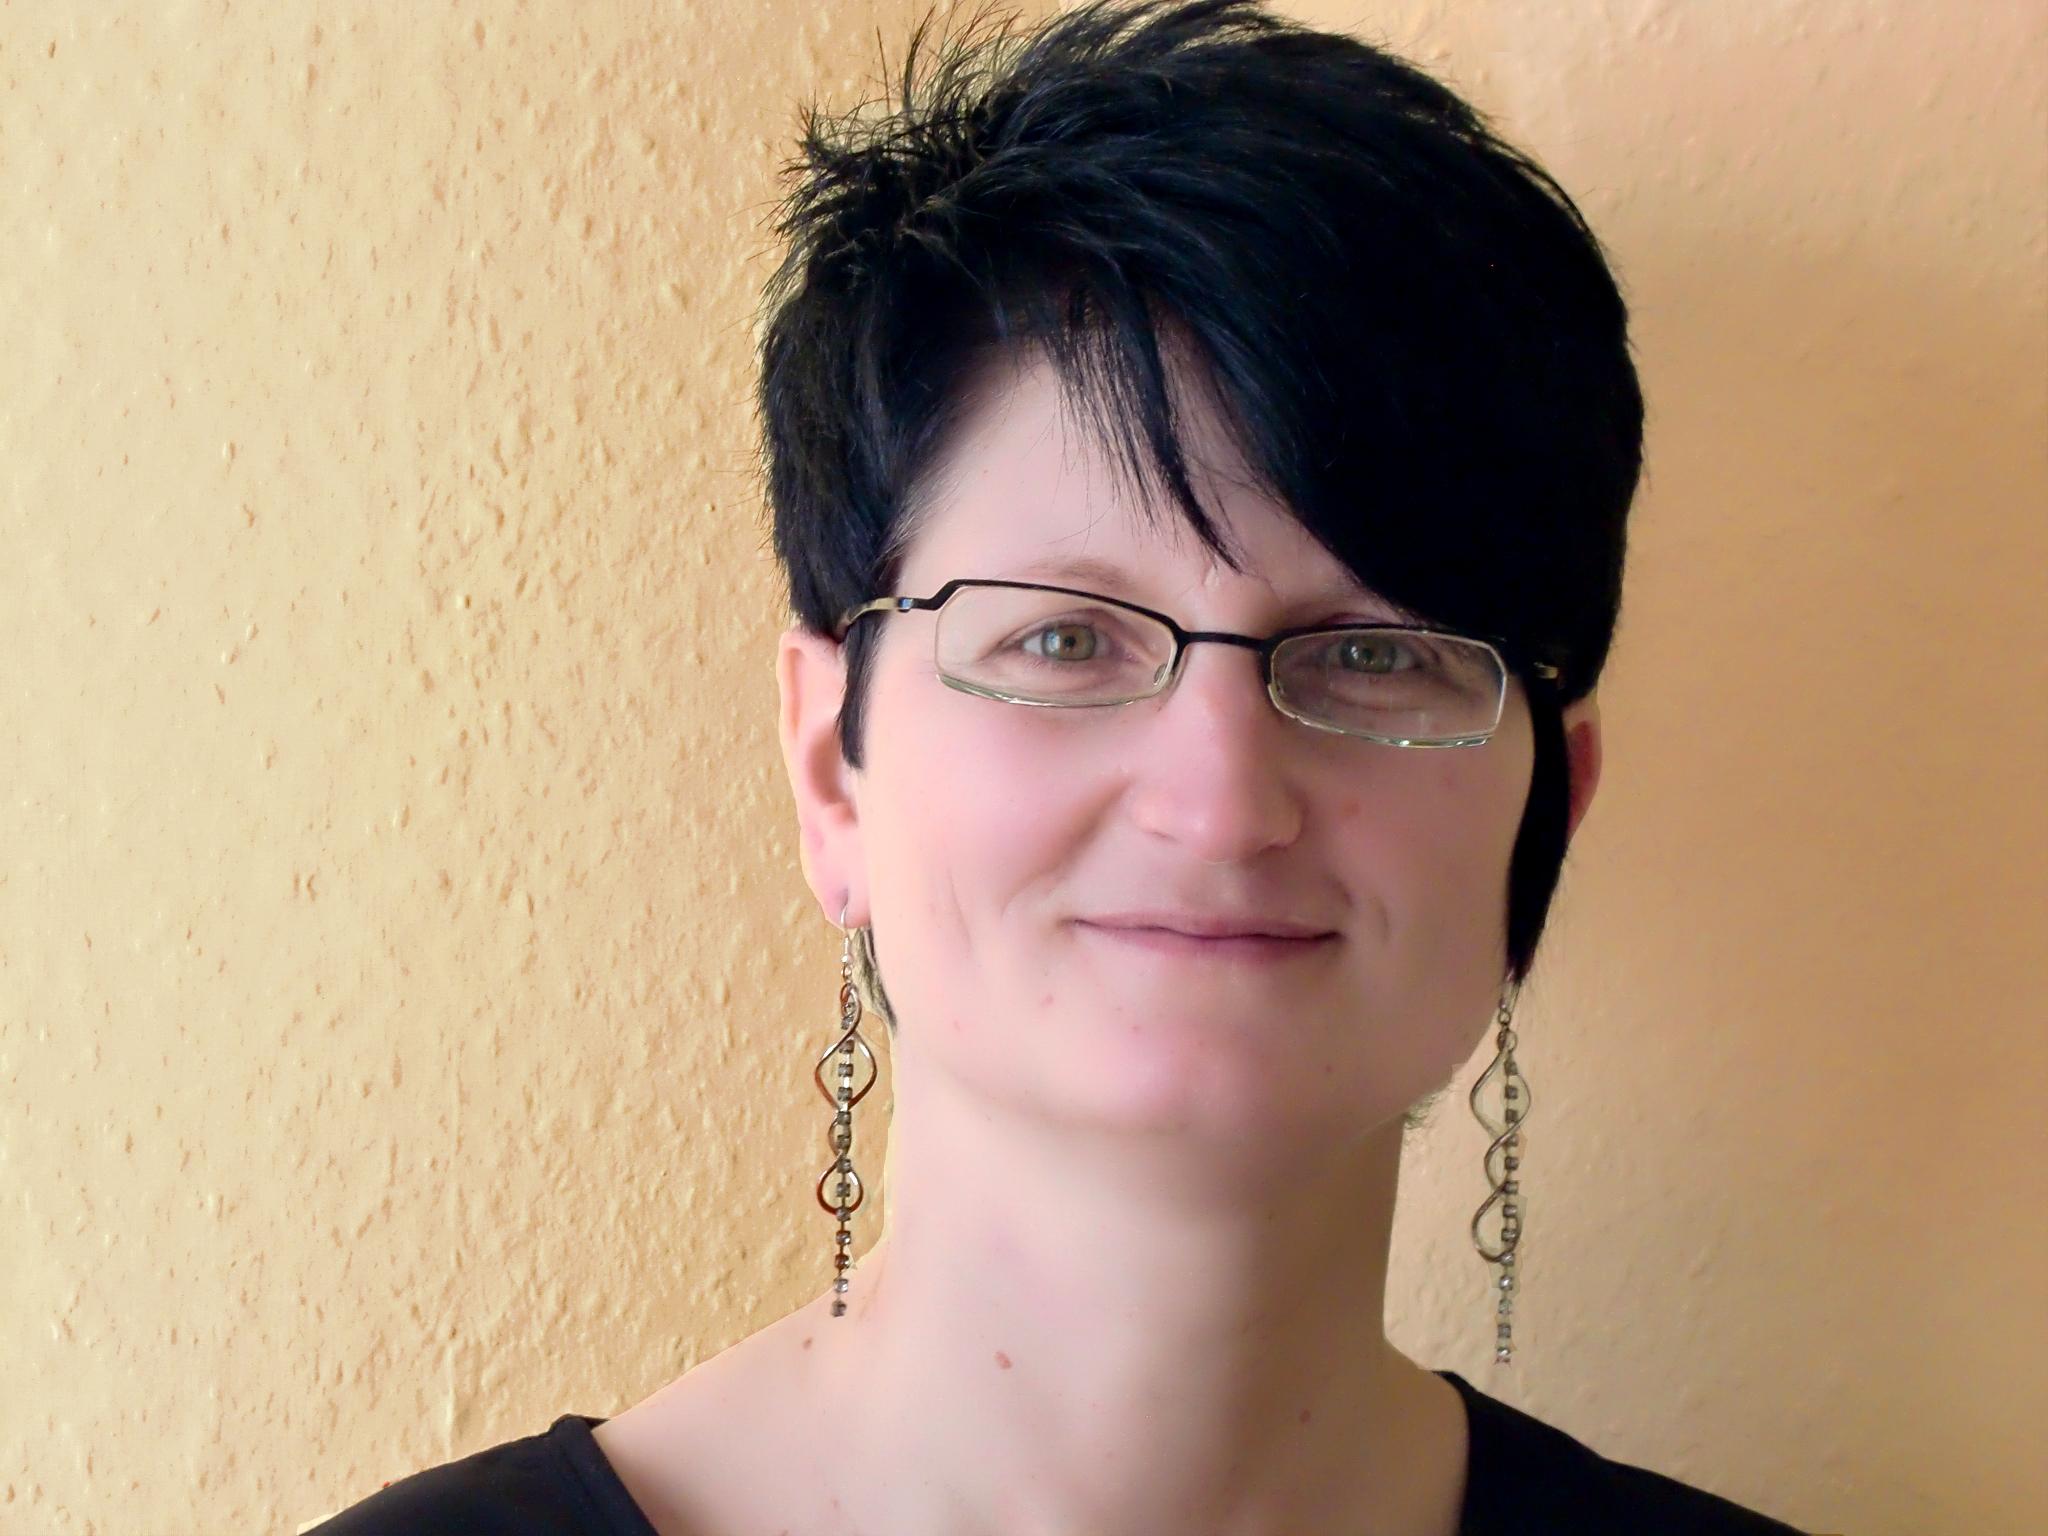 Nadine Zander